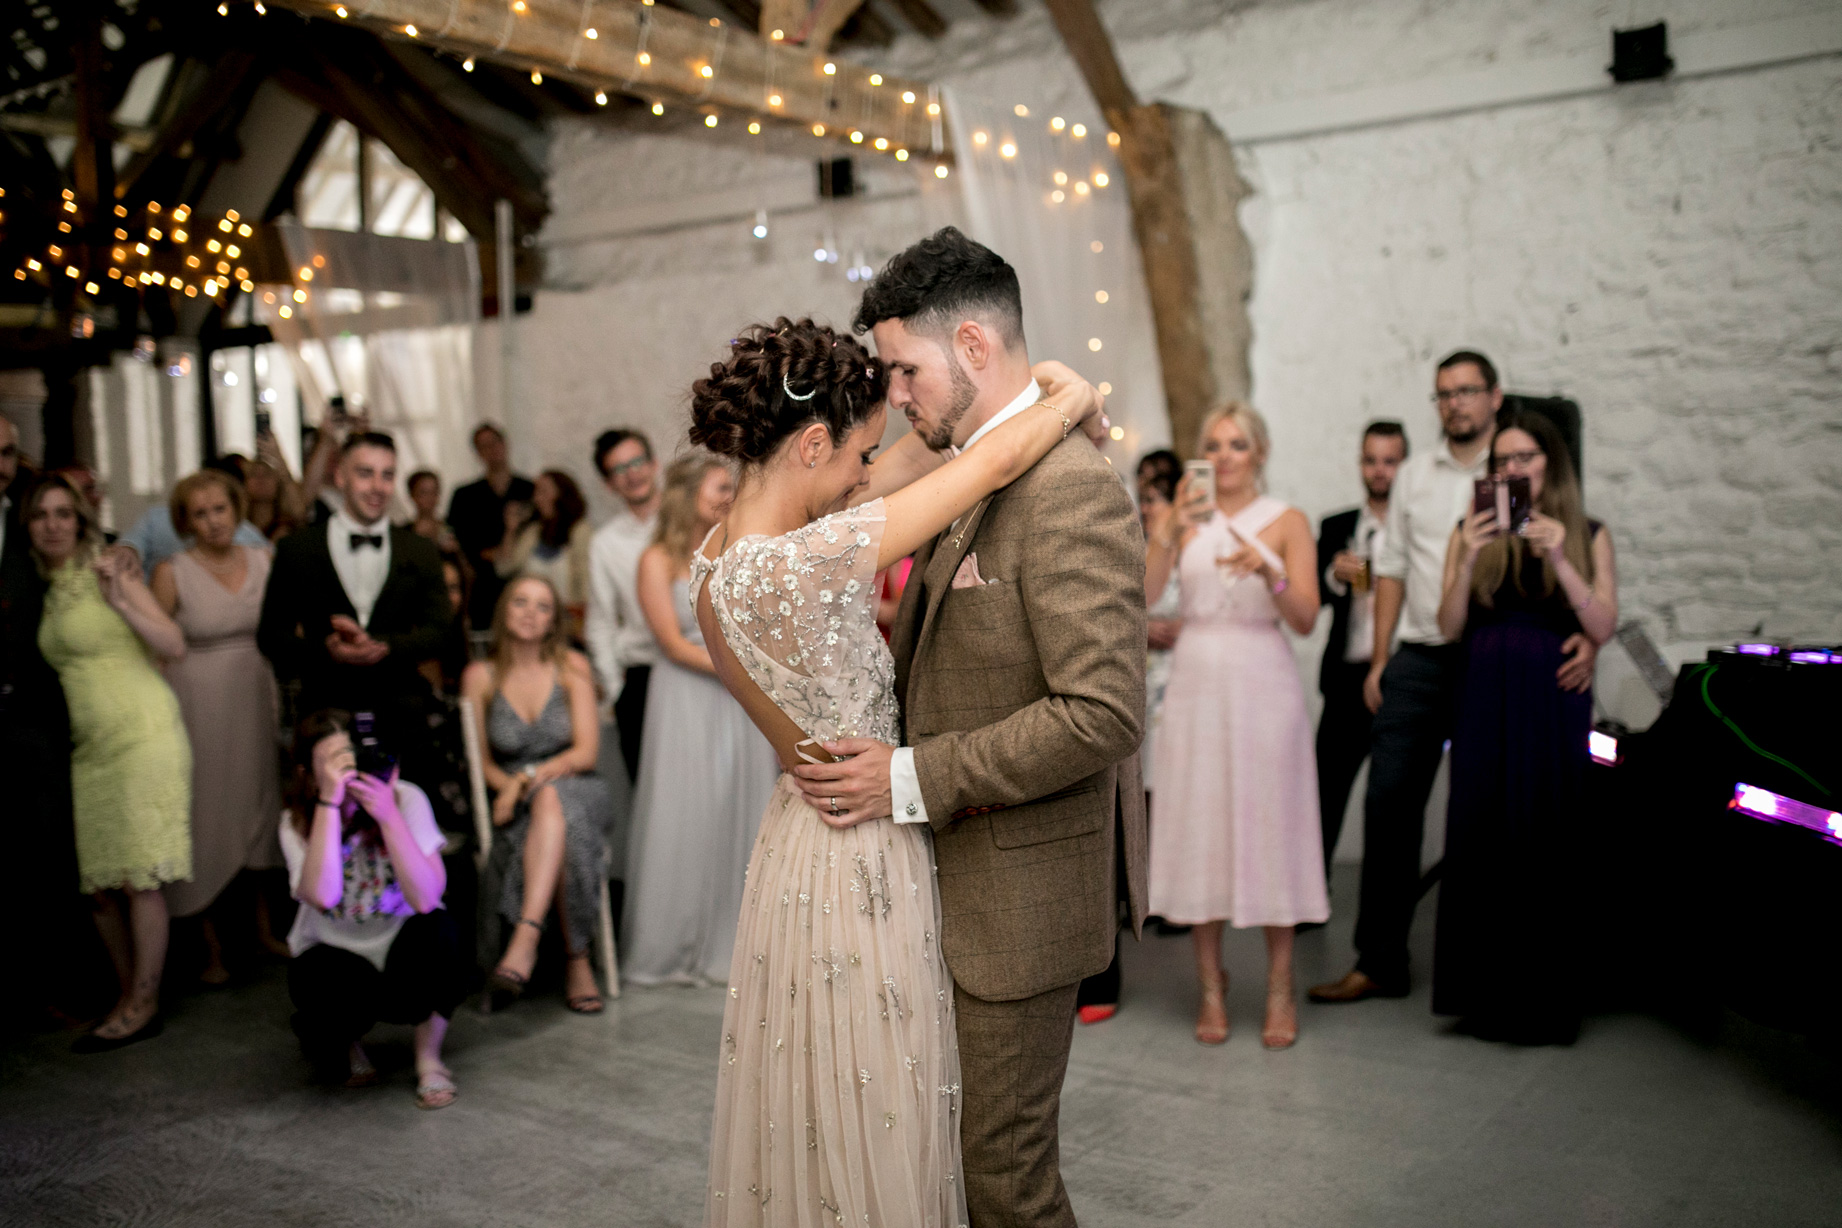 Couple, First Dance, Barn Wedding, Bedfordshire Wedding, Fairy Lights,